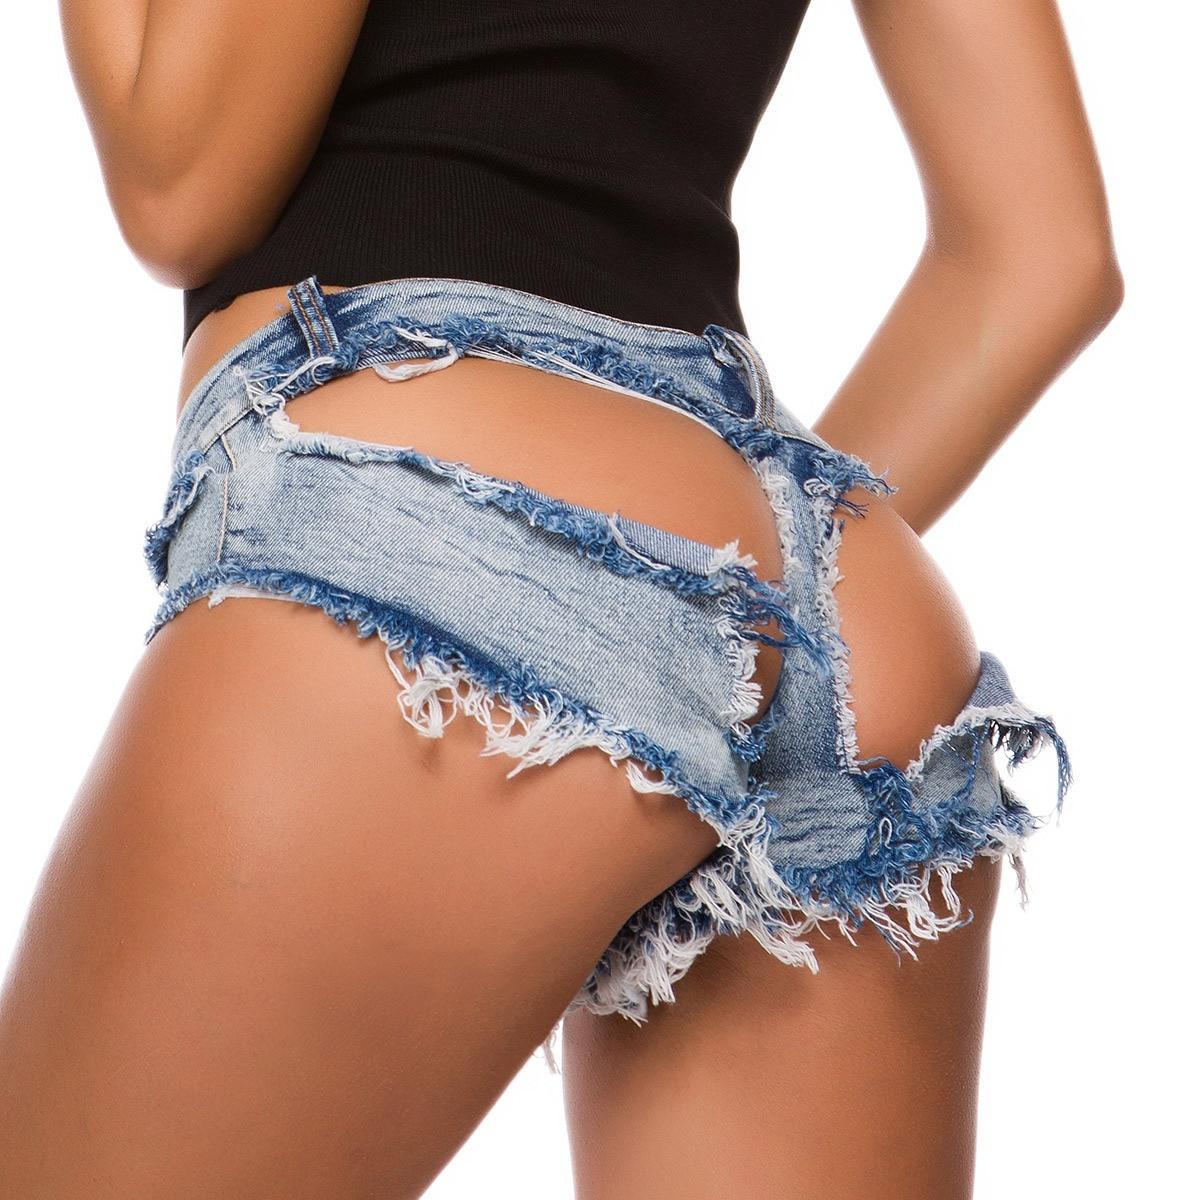 Ripped Women Sexy Jeans Shorts Summer Low-waist Denim Hollow Out  Mini Short Beach Baggy Shorts Club  DK087S30 Bikini Bottom